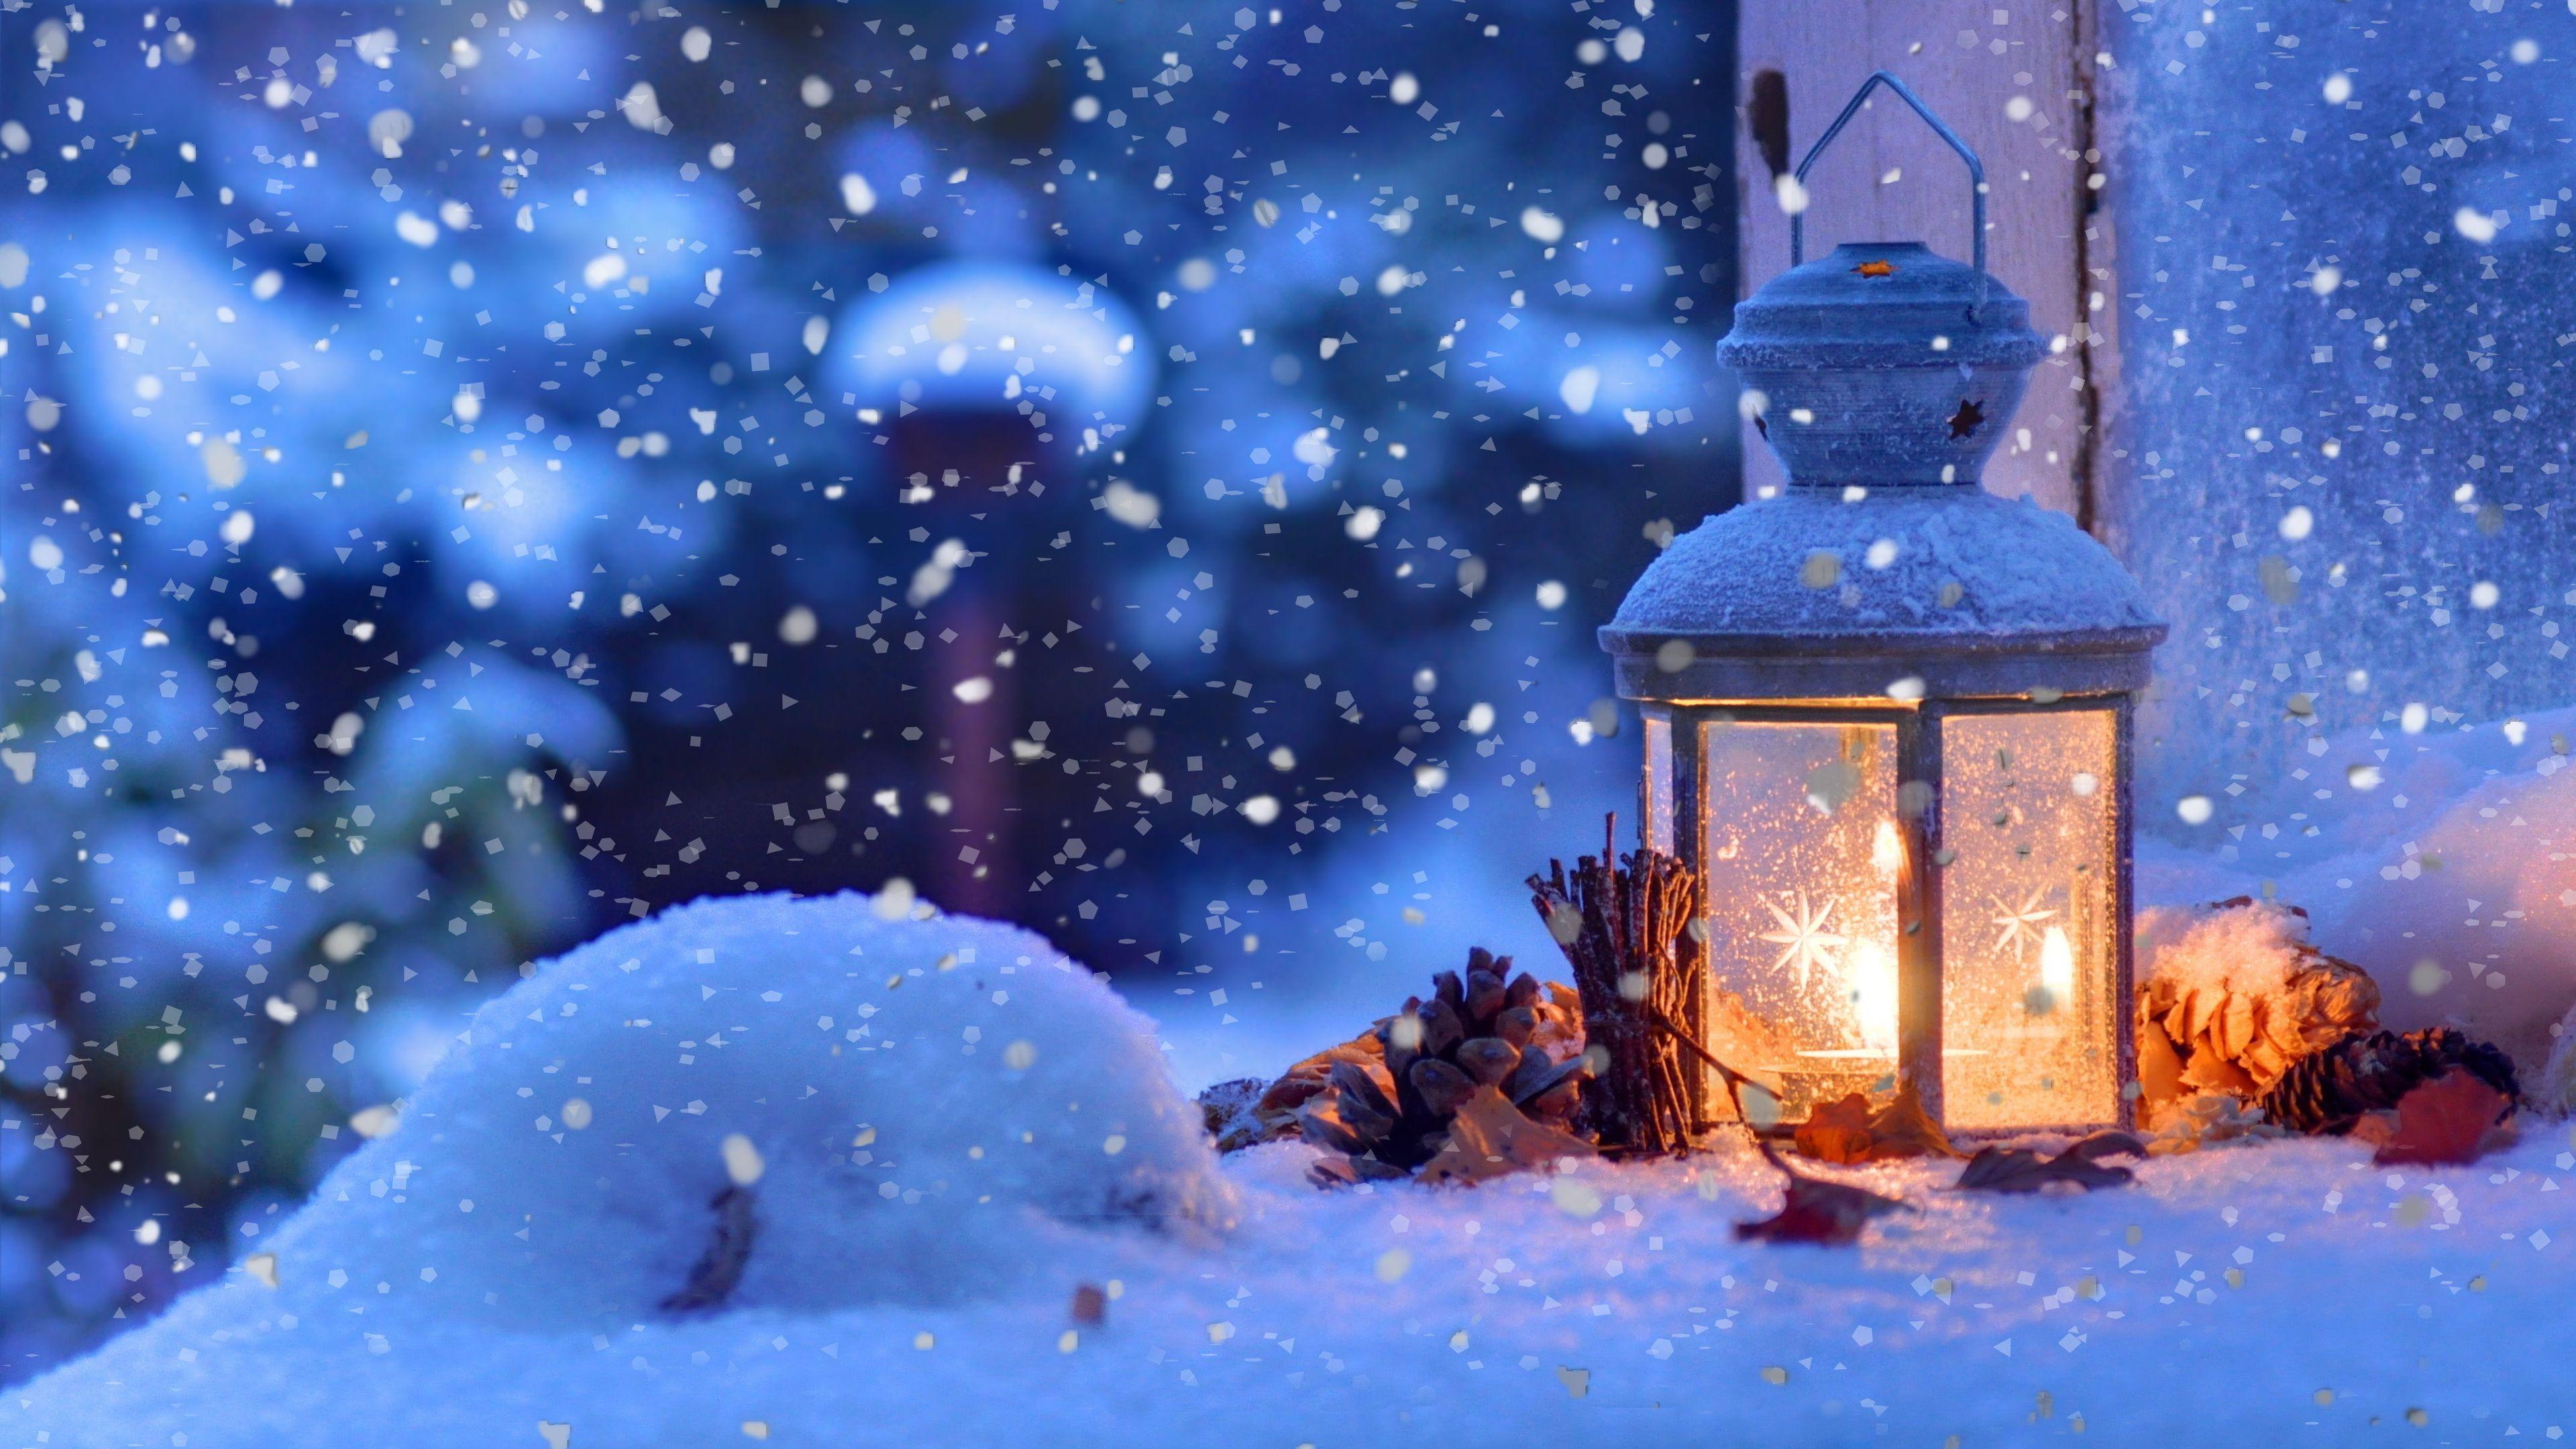 Cozy Winter Desktop Wallpapers Top Free Cozy Winter